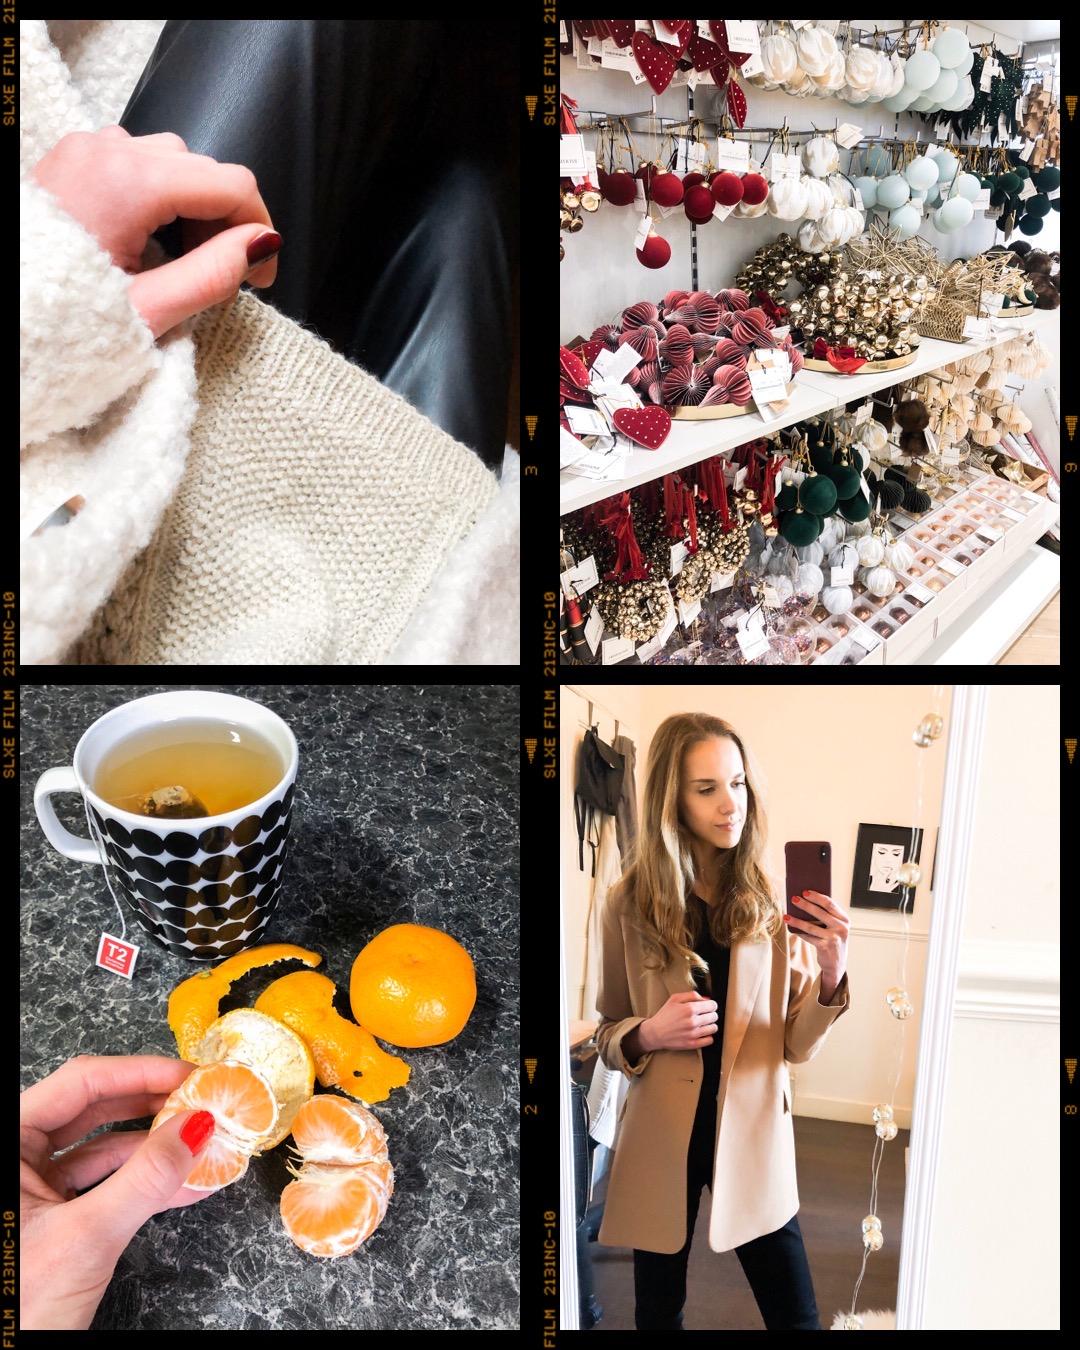 Autumn fashion textures, H&M Christmas decorations, Marimekko mug, satsumas, camel blazer Topshop - syysmuoti, H&M joulukoristeet, Marimekko Räsymatto muki, satsuma, kamelinvärinen bleiseri